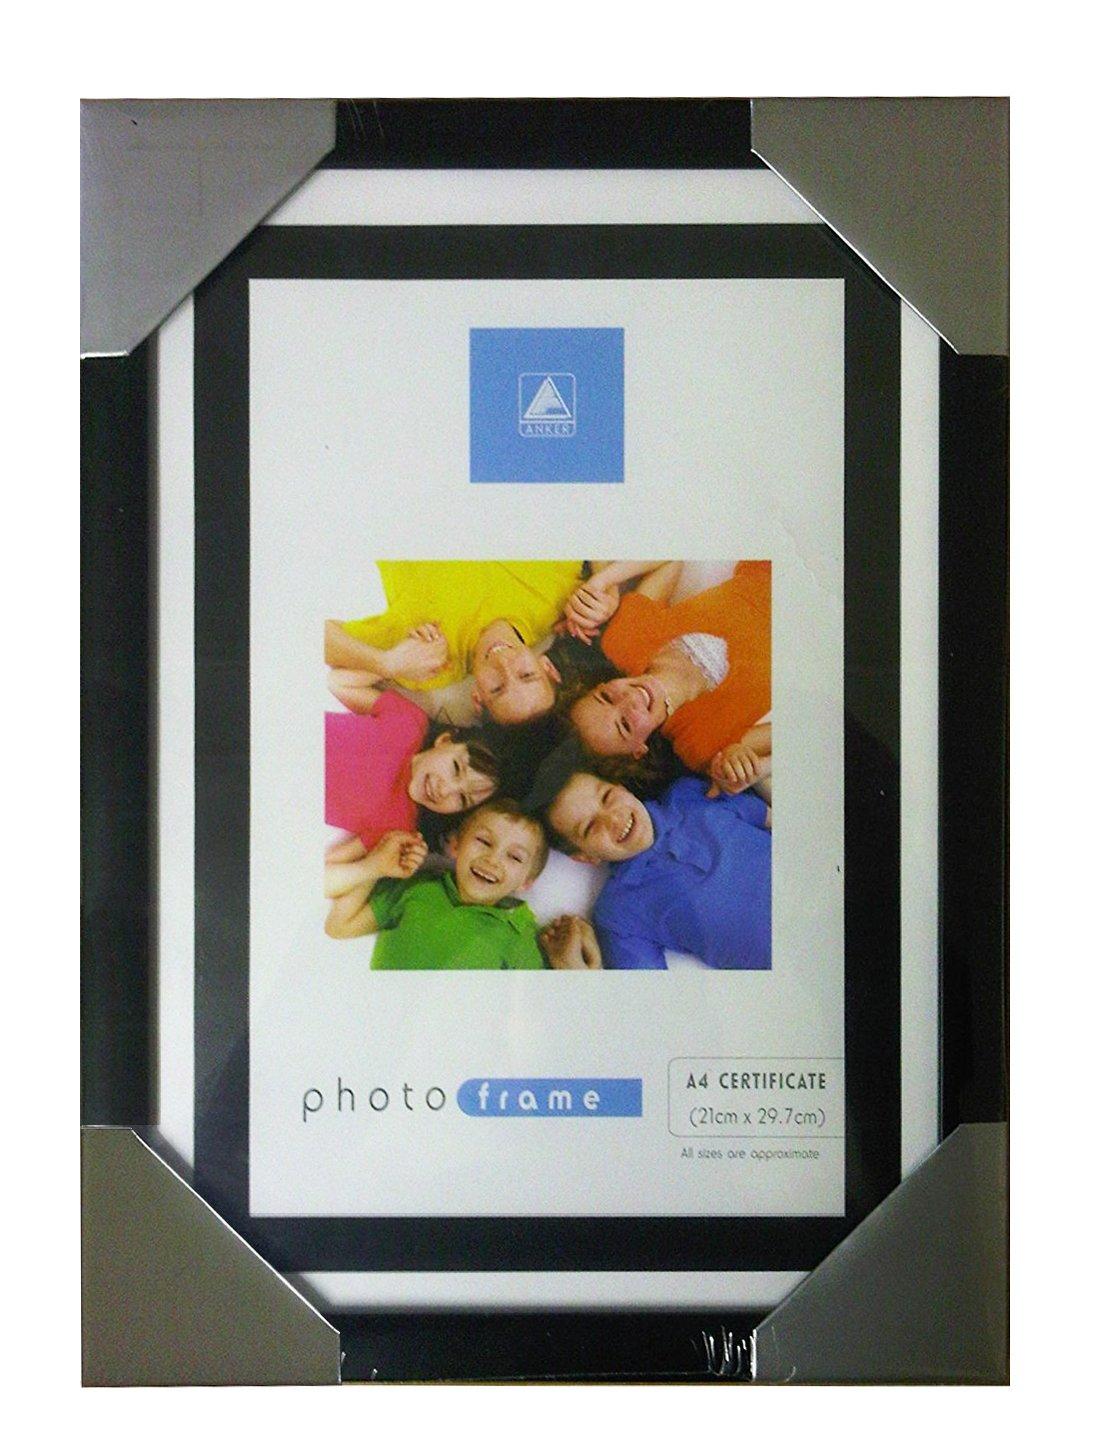 Amazon.com - A4 Certificate Photo Picture Frame BLACK -